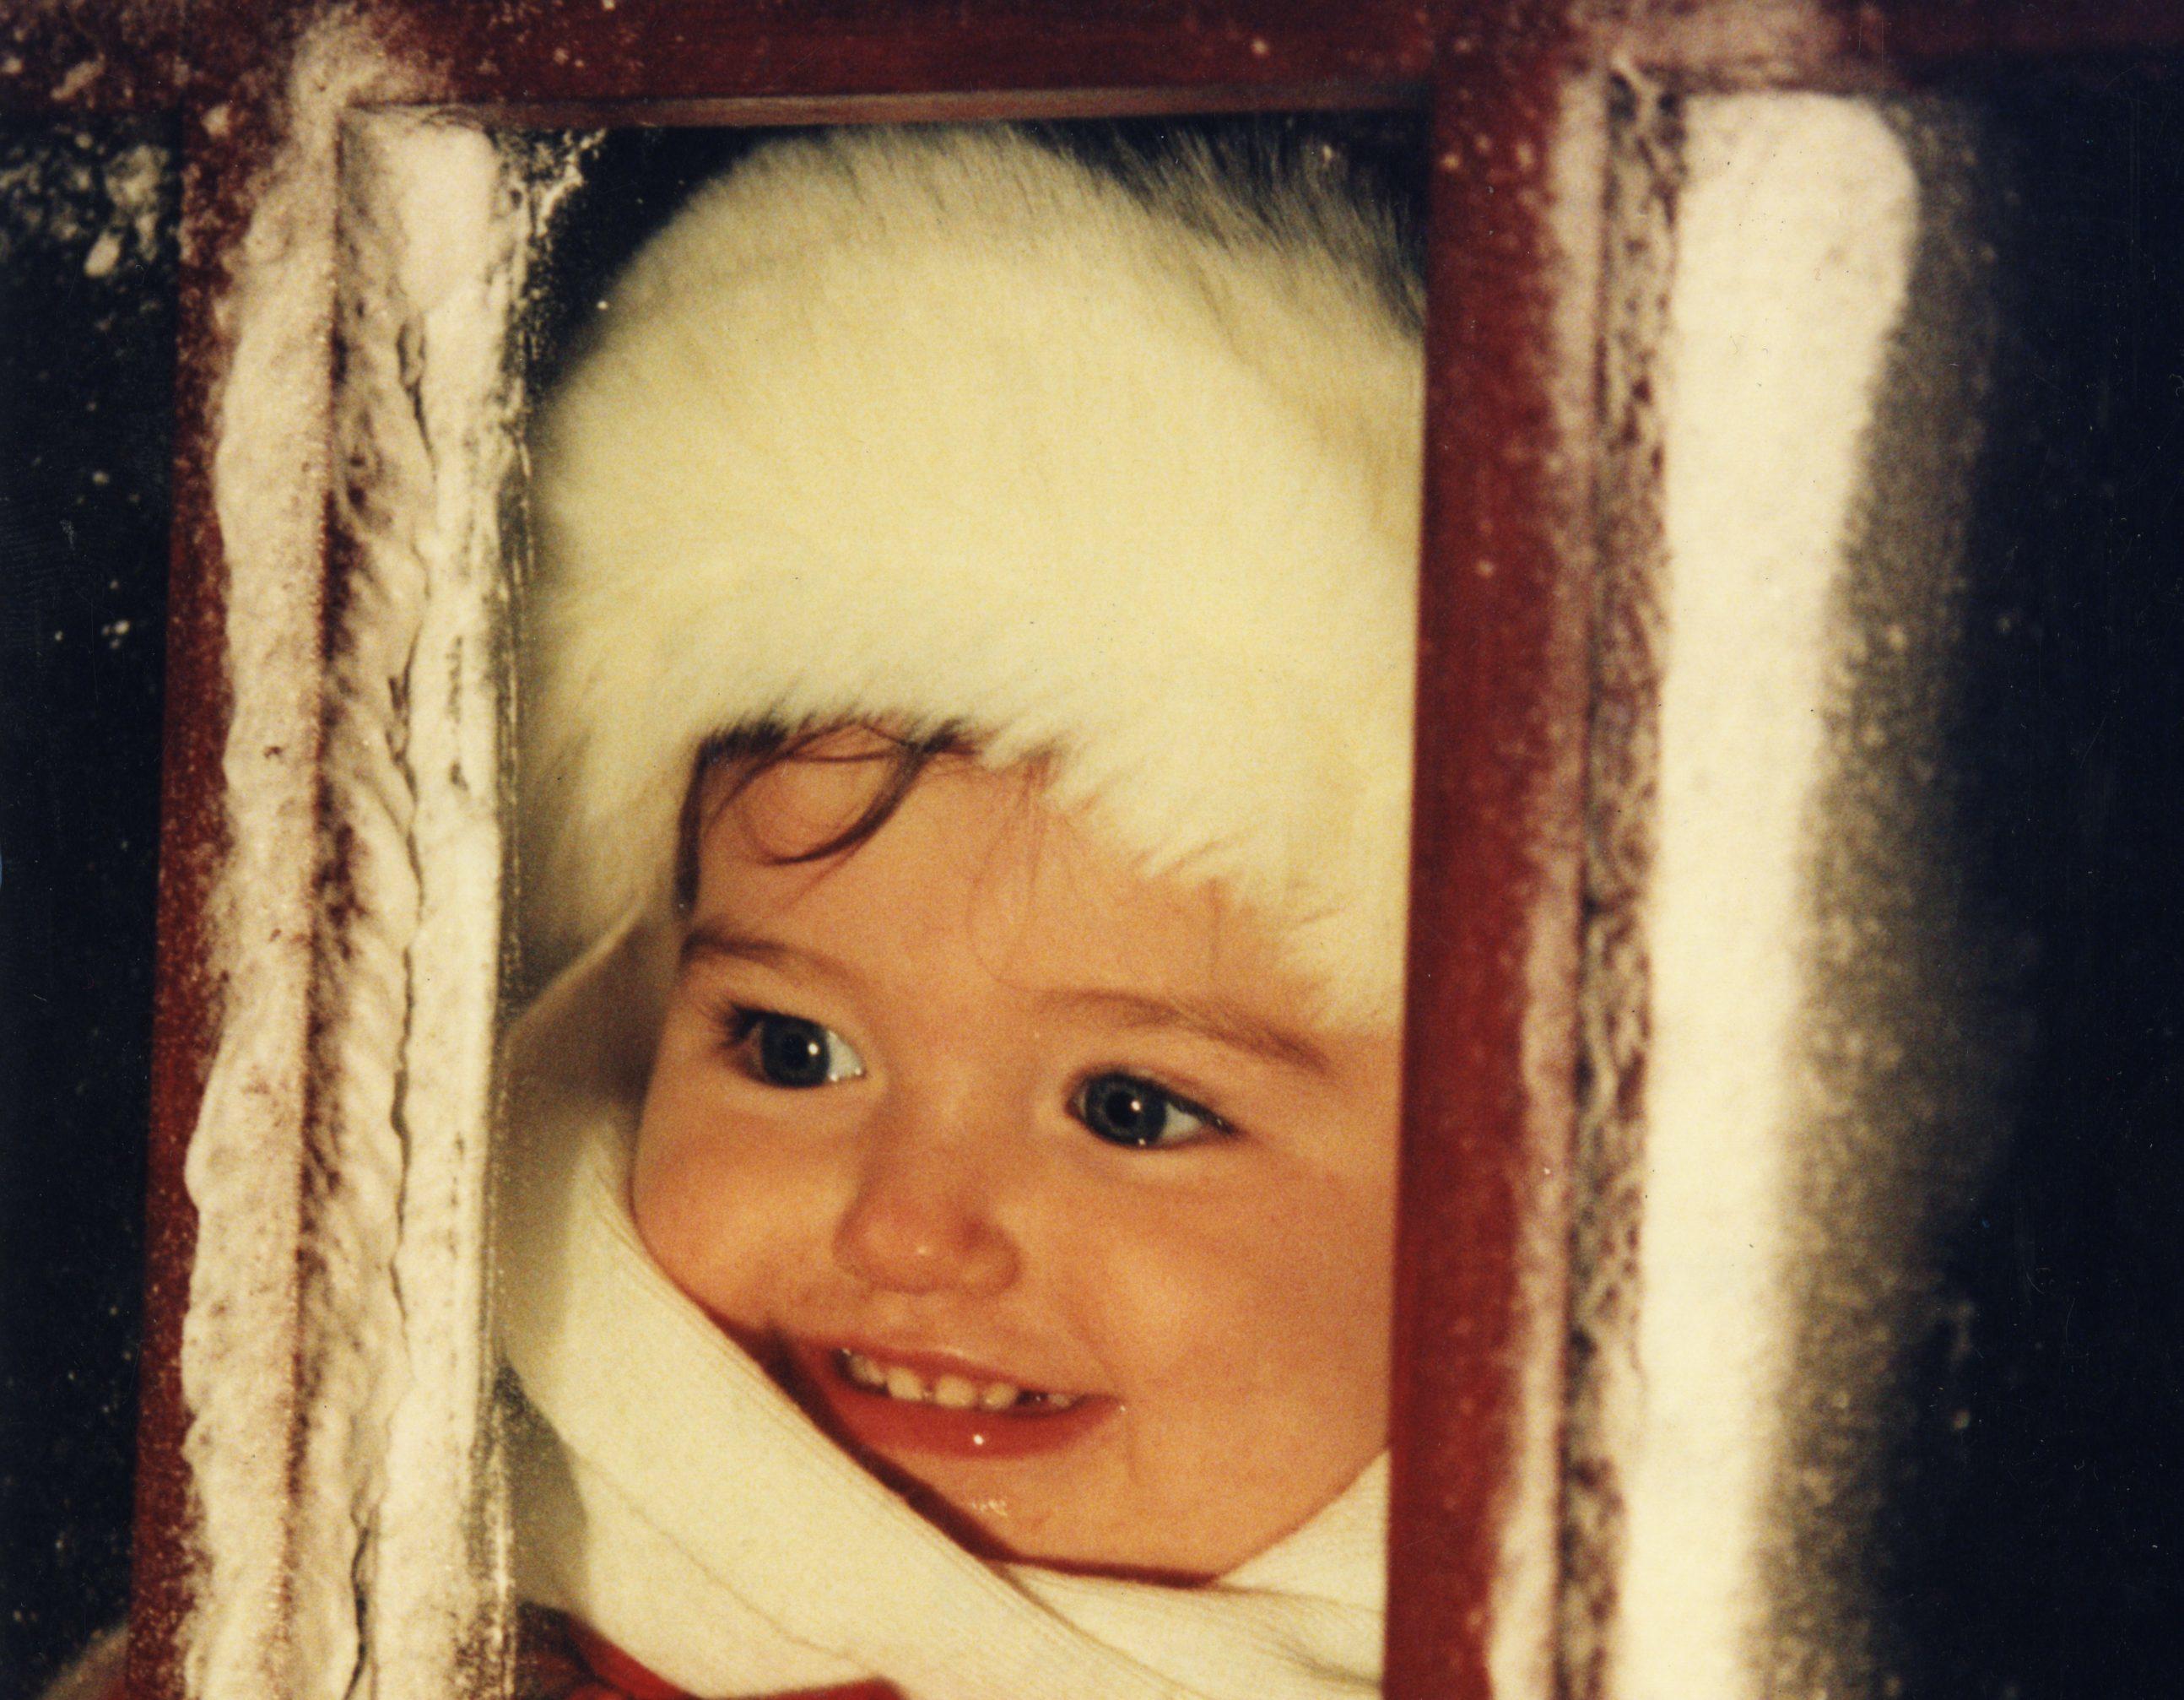 St Johnstone defender John McQuillan's daughter one-year-old Taylor McQuillan in 1997.